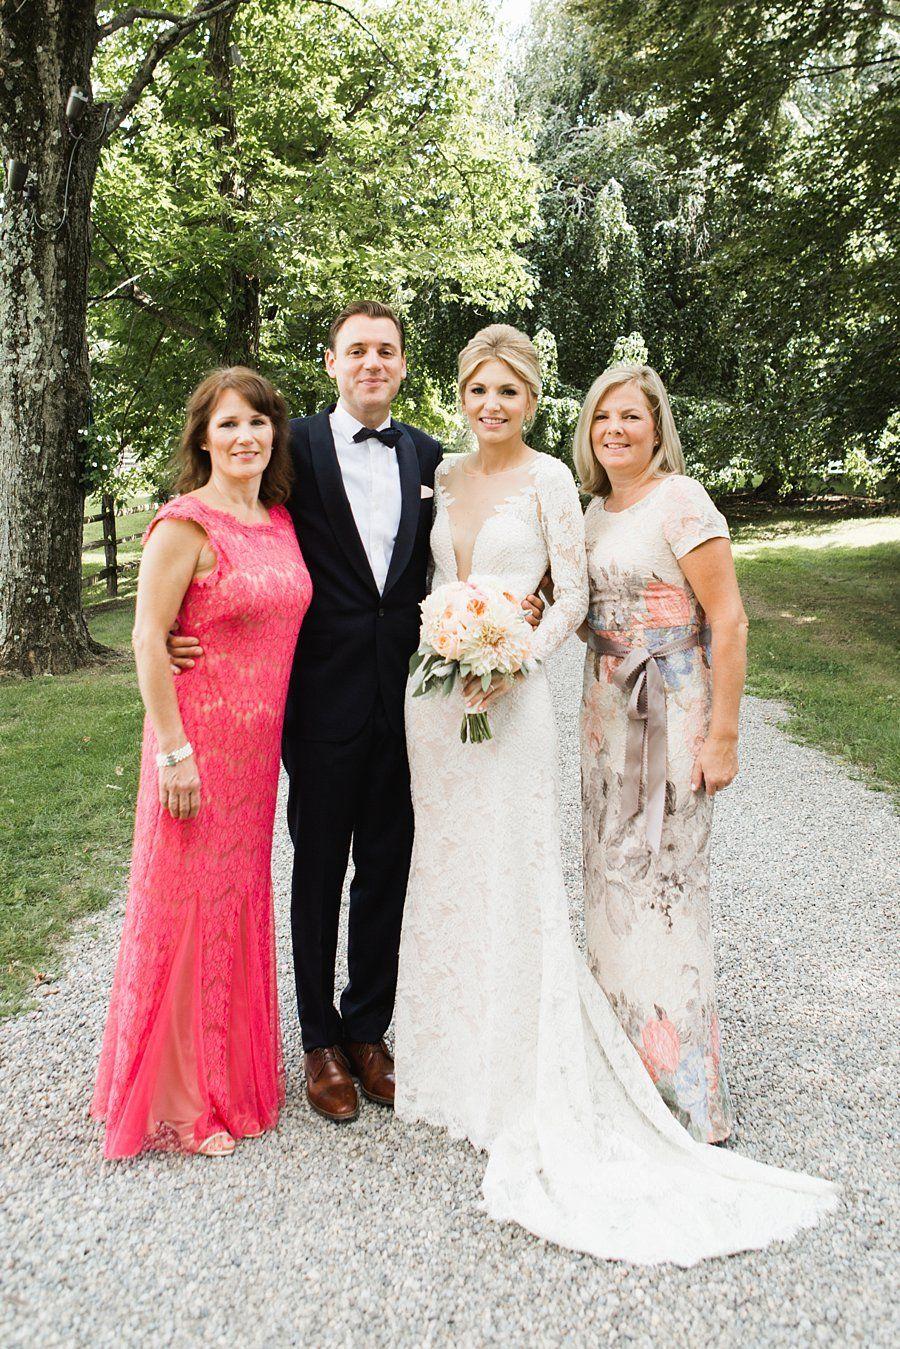 Jcrew wedding dress  Groomus Attire JCrew  ylemeprettyportfolio